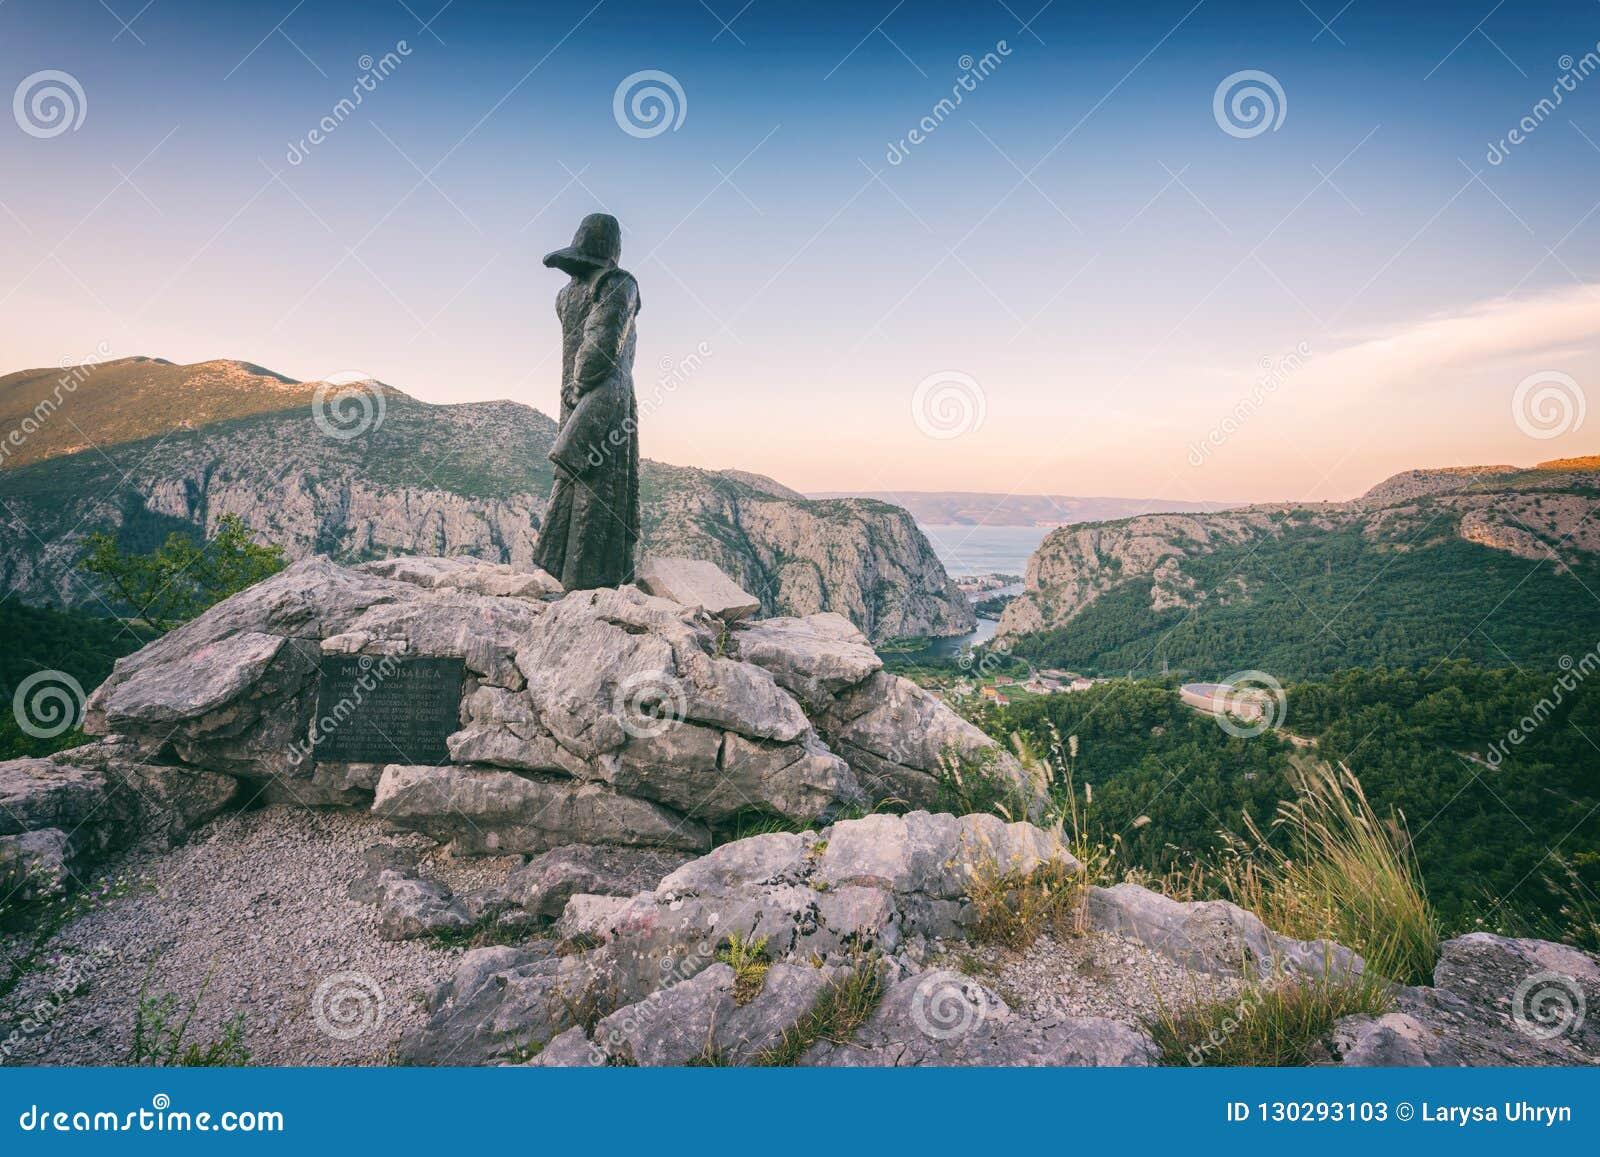 Statue of legendary Mila Gojsalic on top of a rocky mountain near Omis, Dalmatia, Croatia